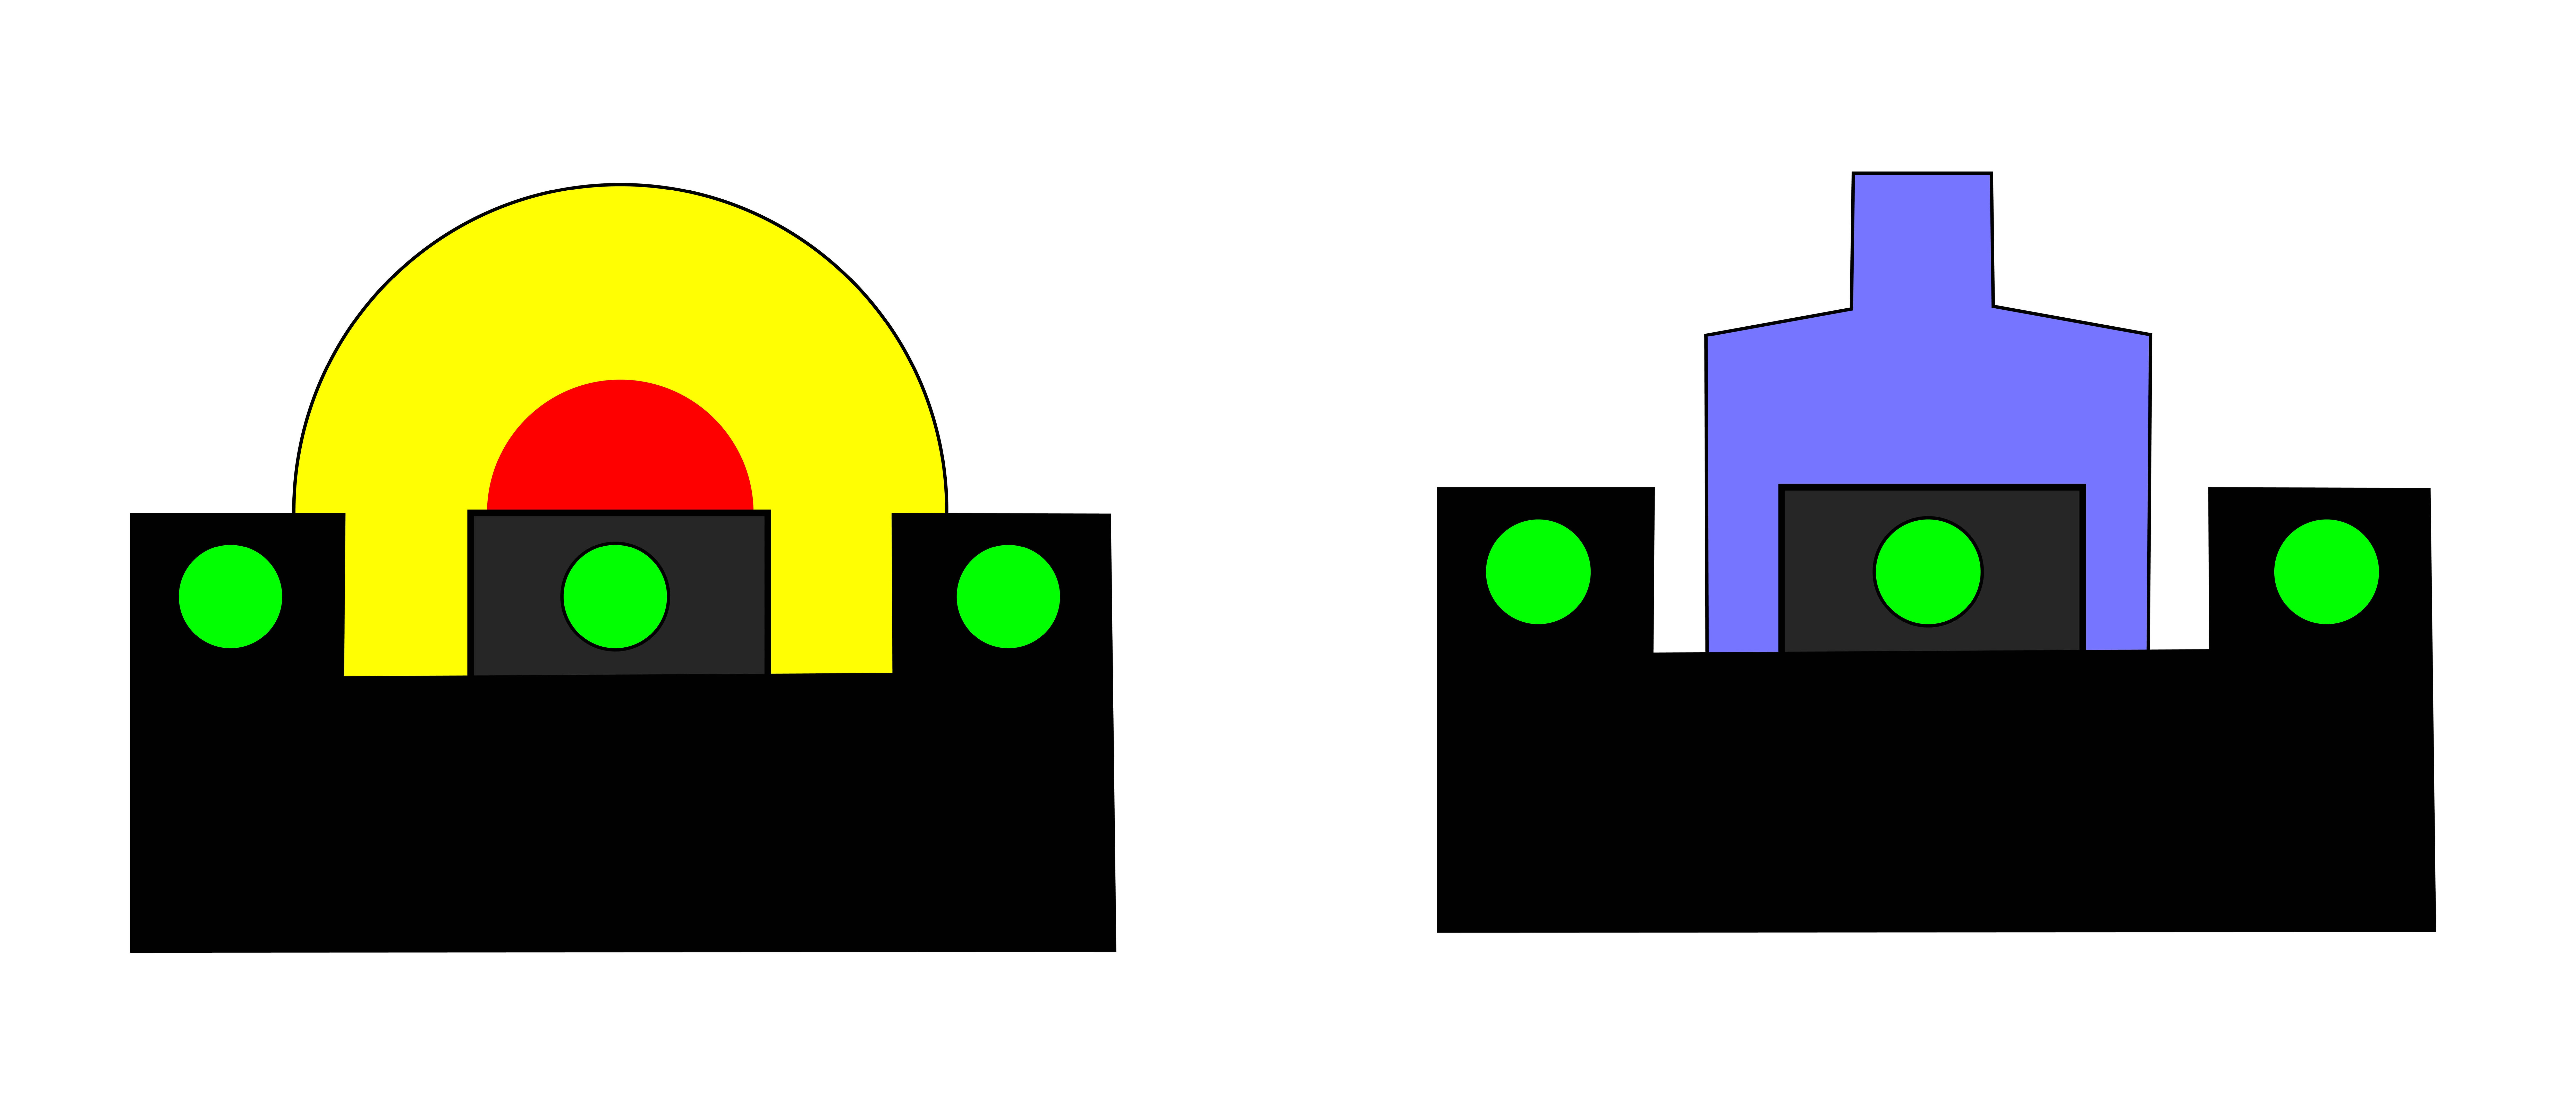 Handgun sight alignment